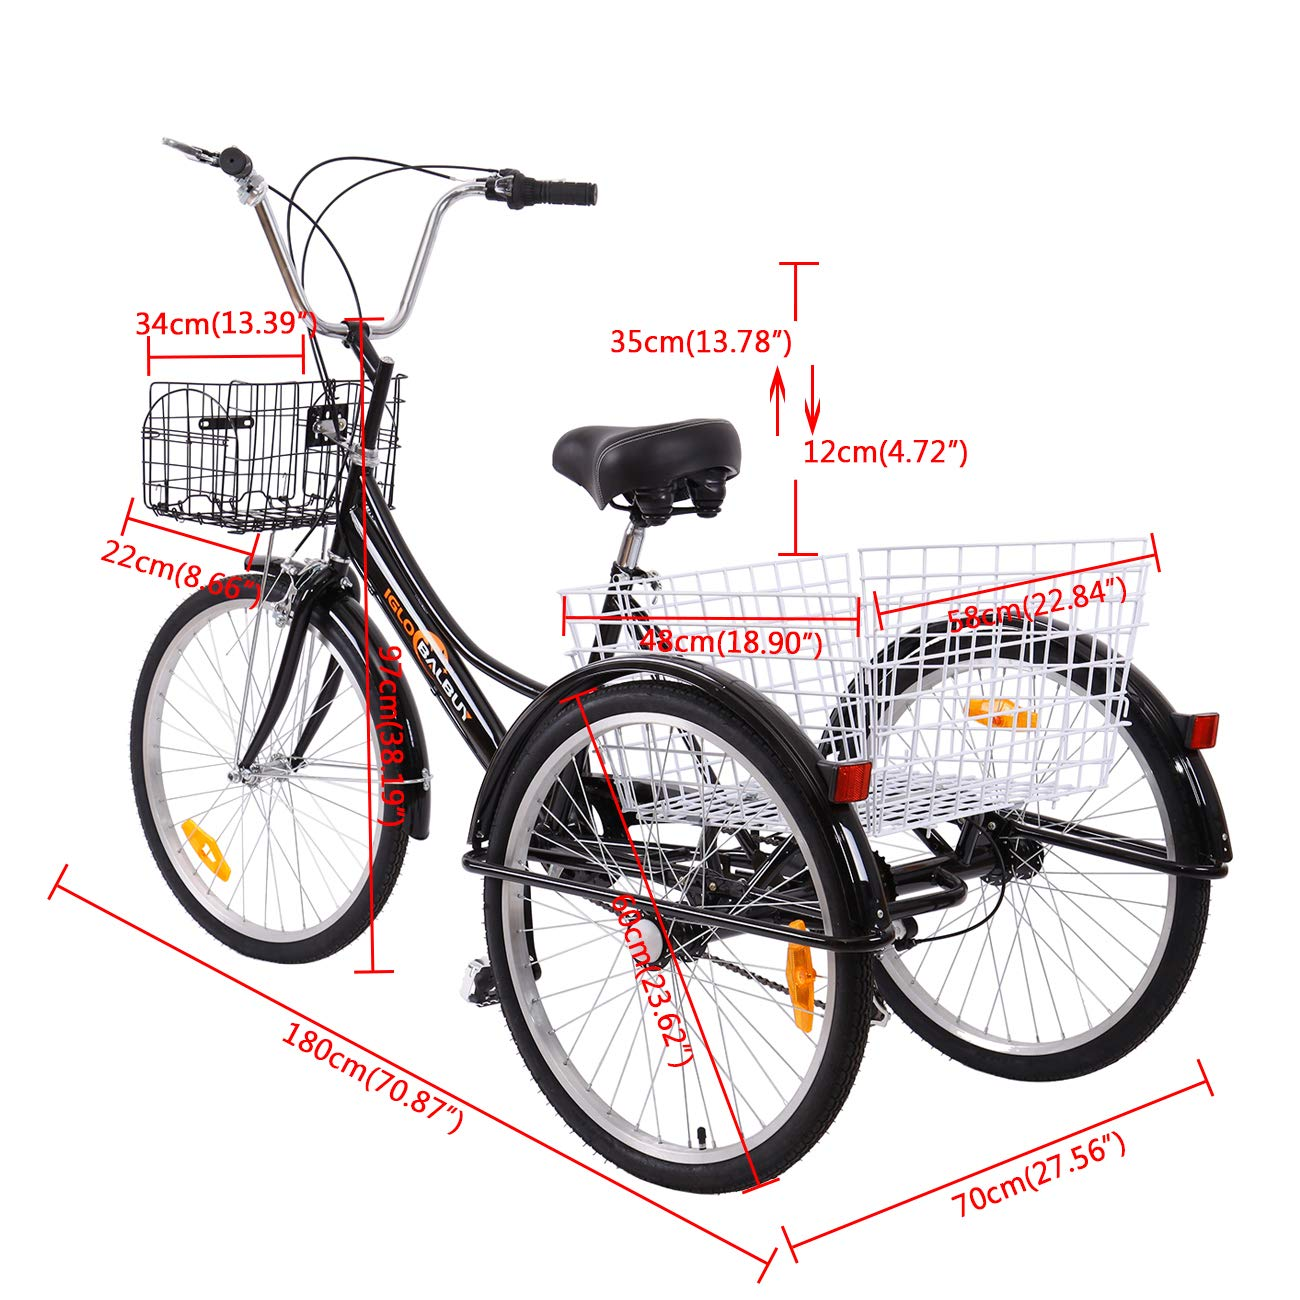 Yonntech Triciclo per Adulti